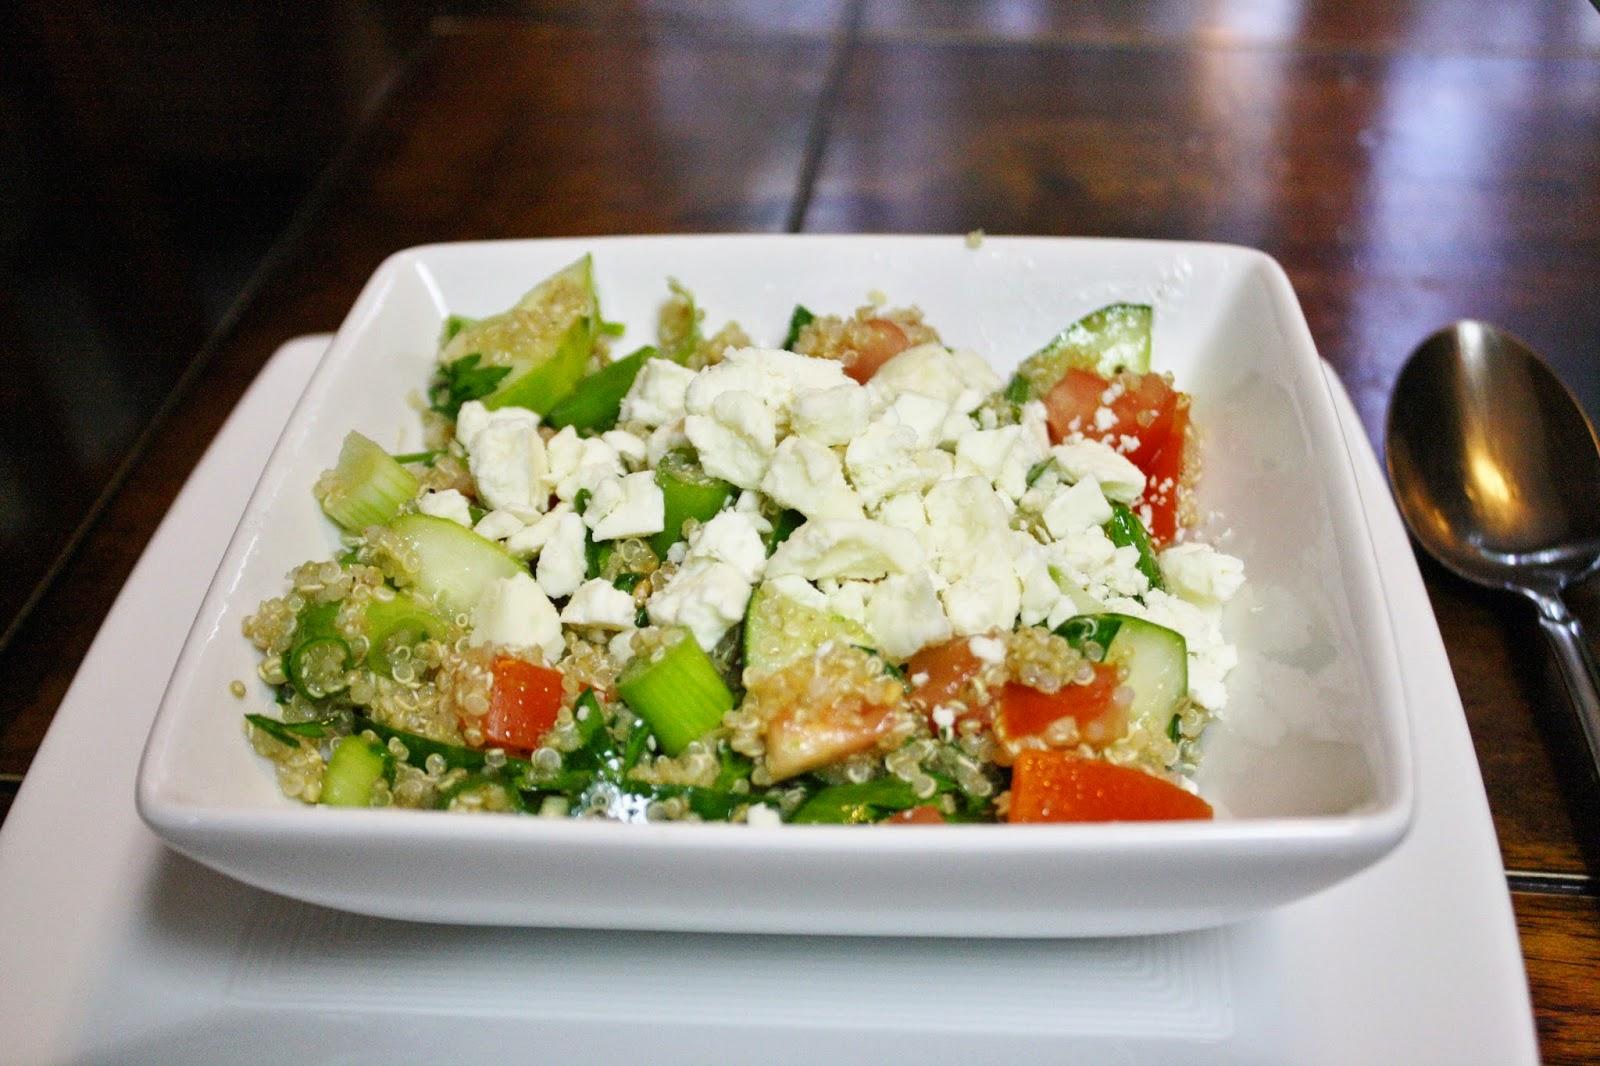 http://eatprayjuice.blogspot.com/2014/06/quinoa-tabbouleh.html